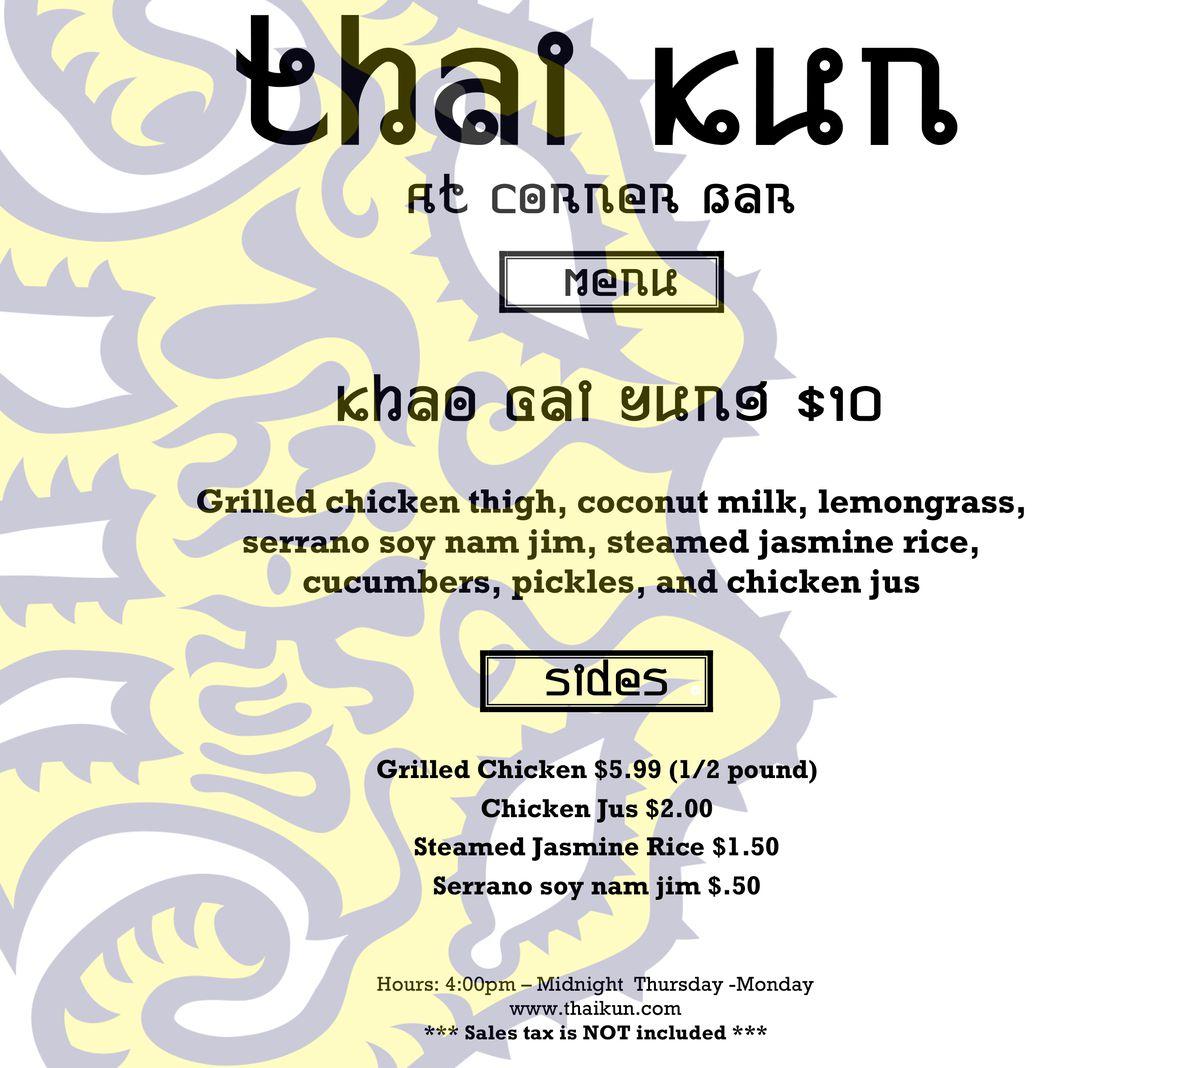 East Side King Thai Kun's Corner Bar menu